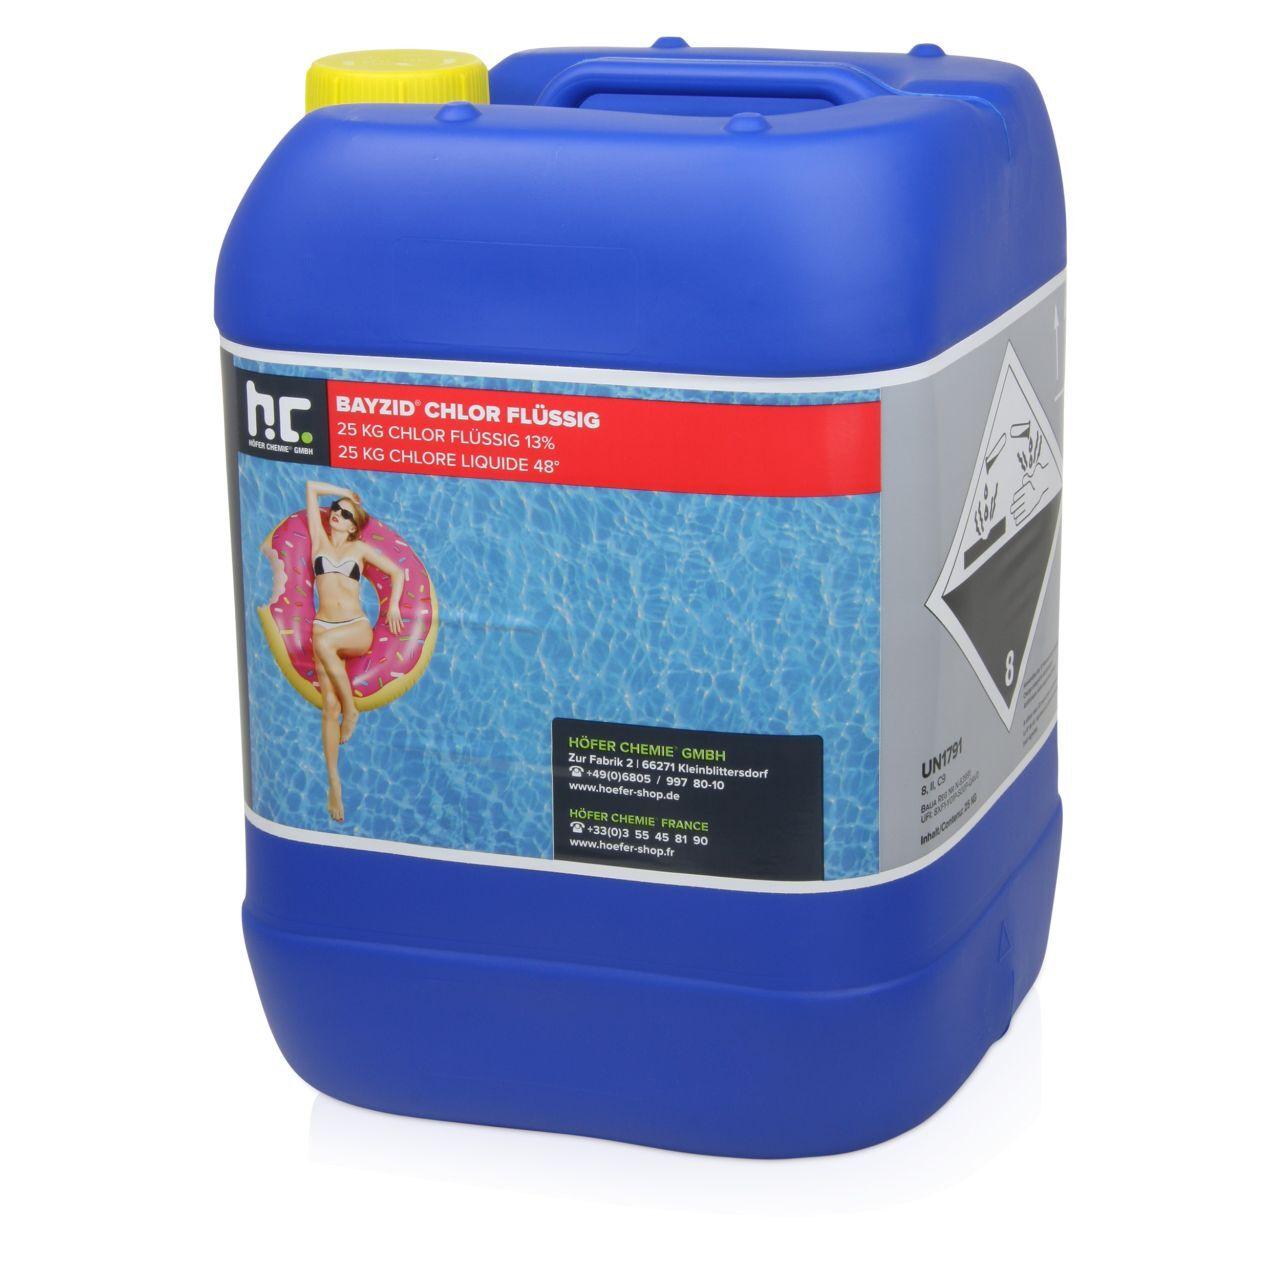 BAYZID 25 kg 20 L) Bayzid® Chlore liquide 48° (1 x 25 kg)